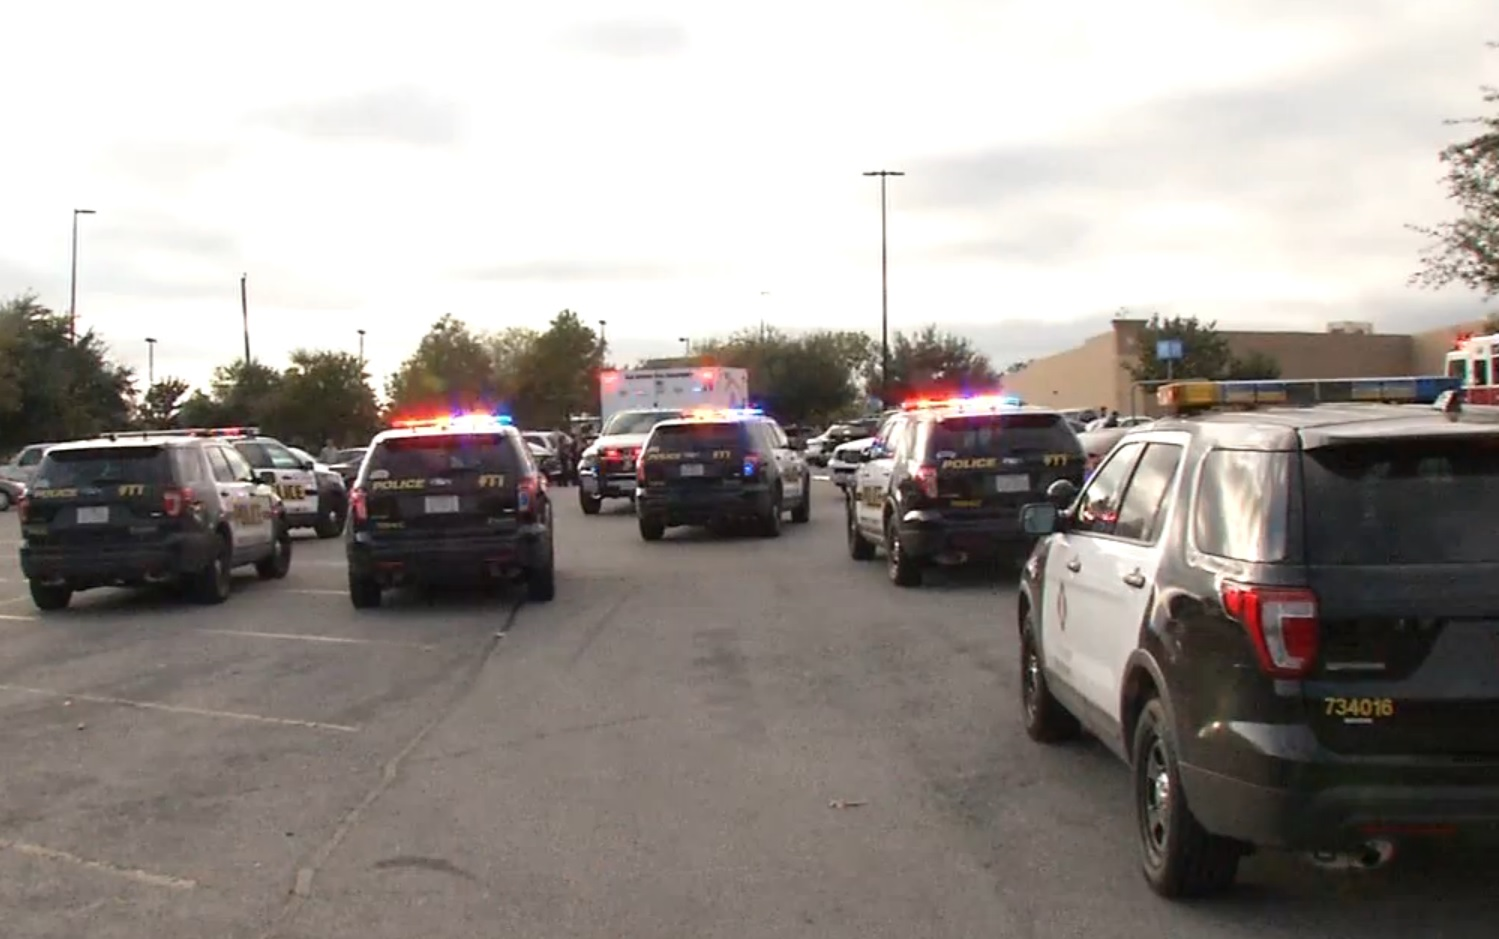 US Police cars